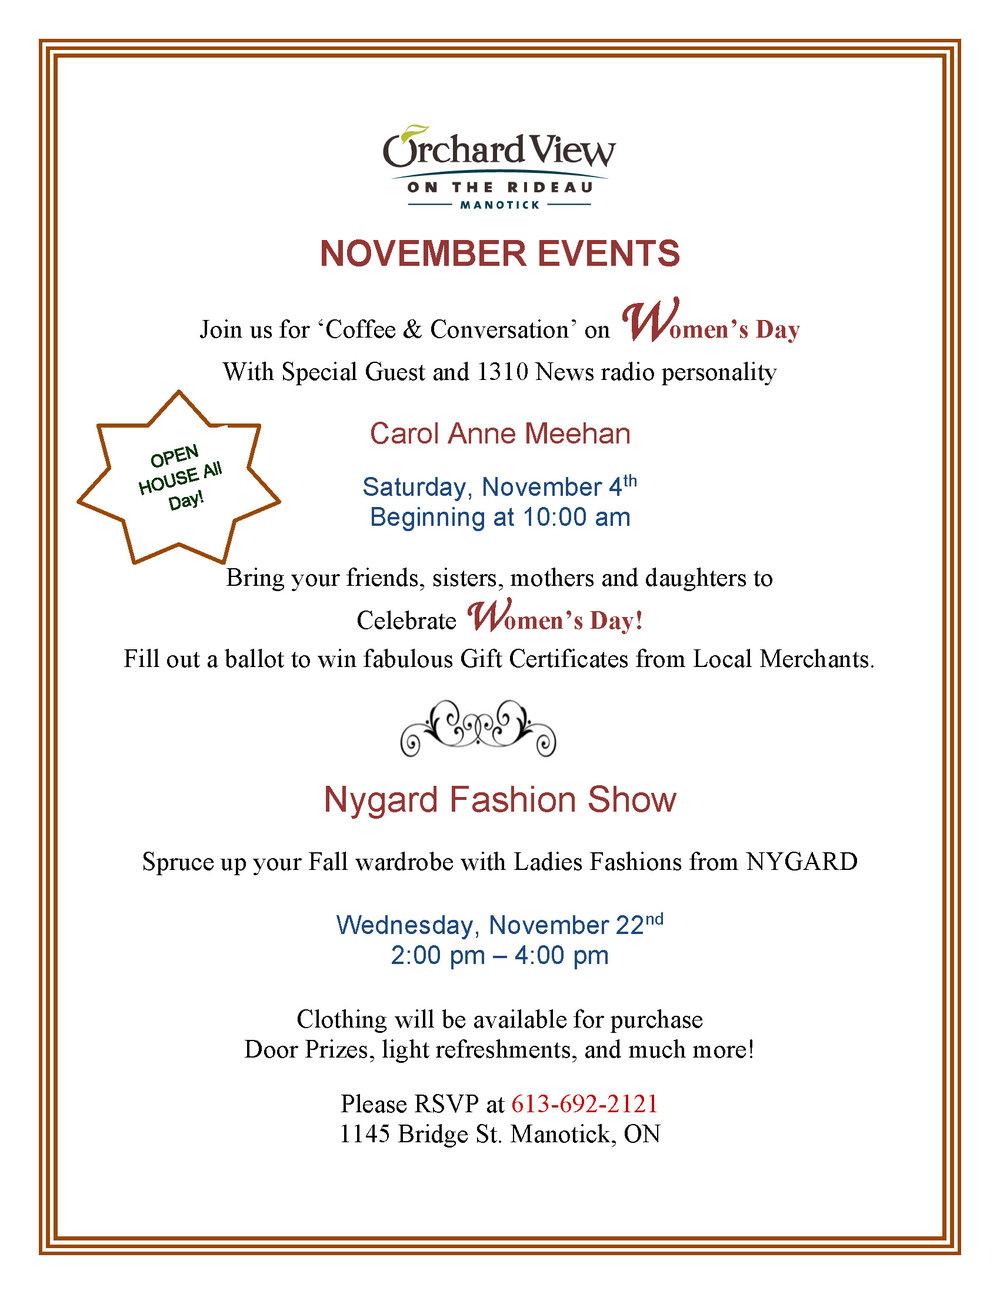 November Events Poster.jpg